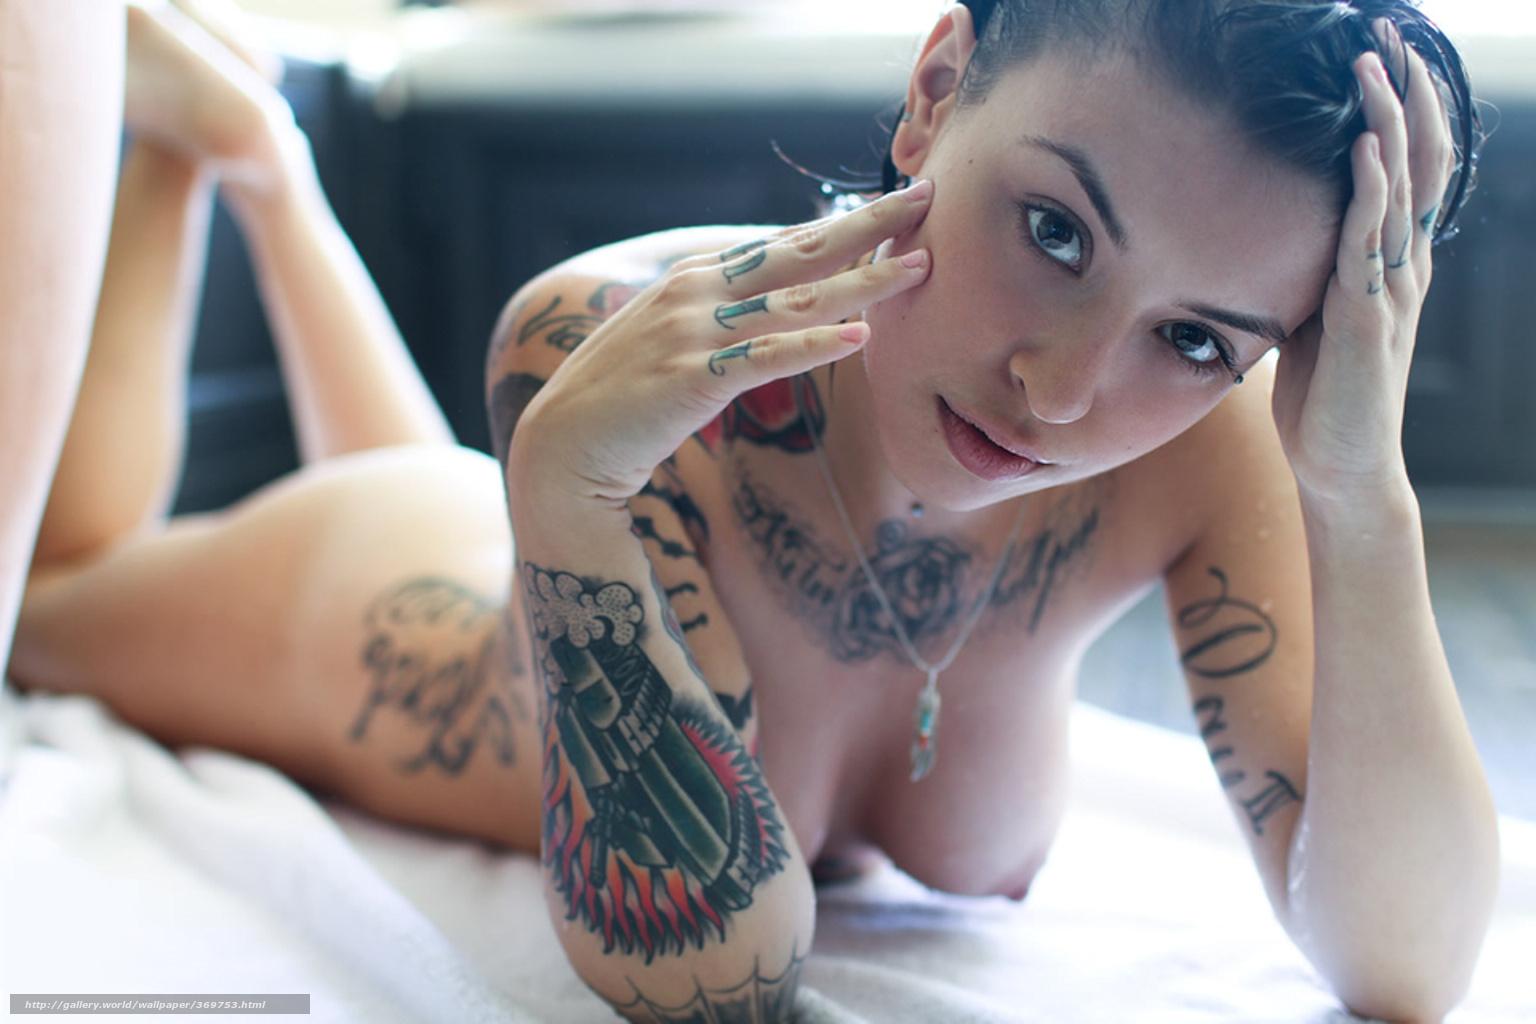 Nude girl ful size pix album erotica shaved wife